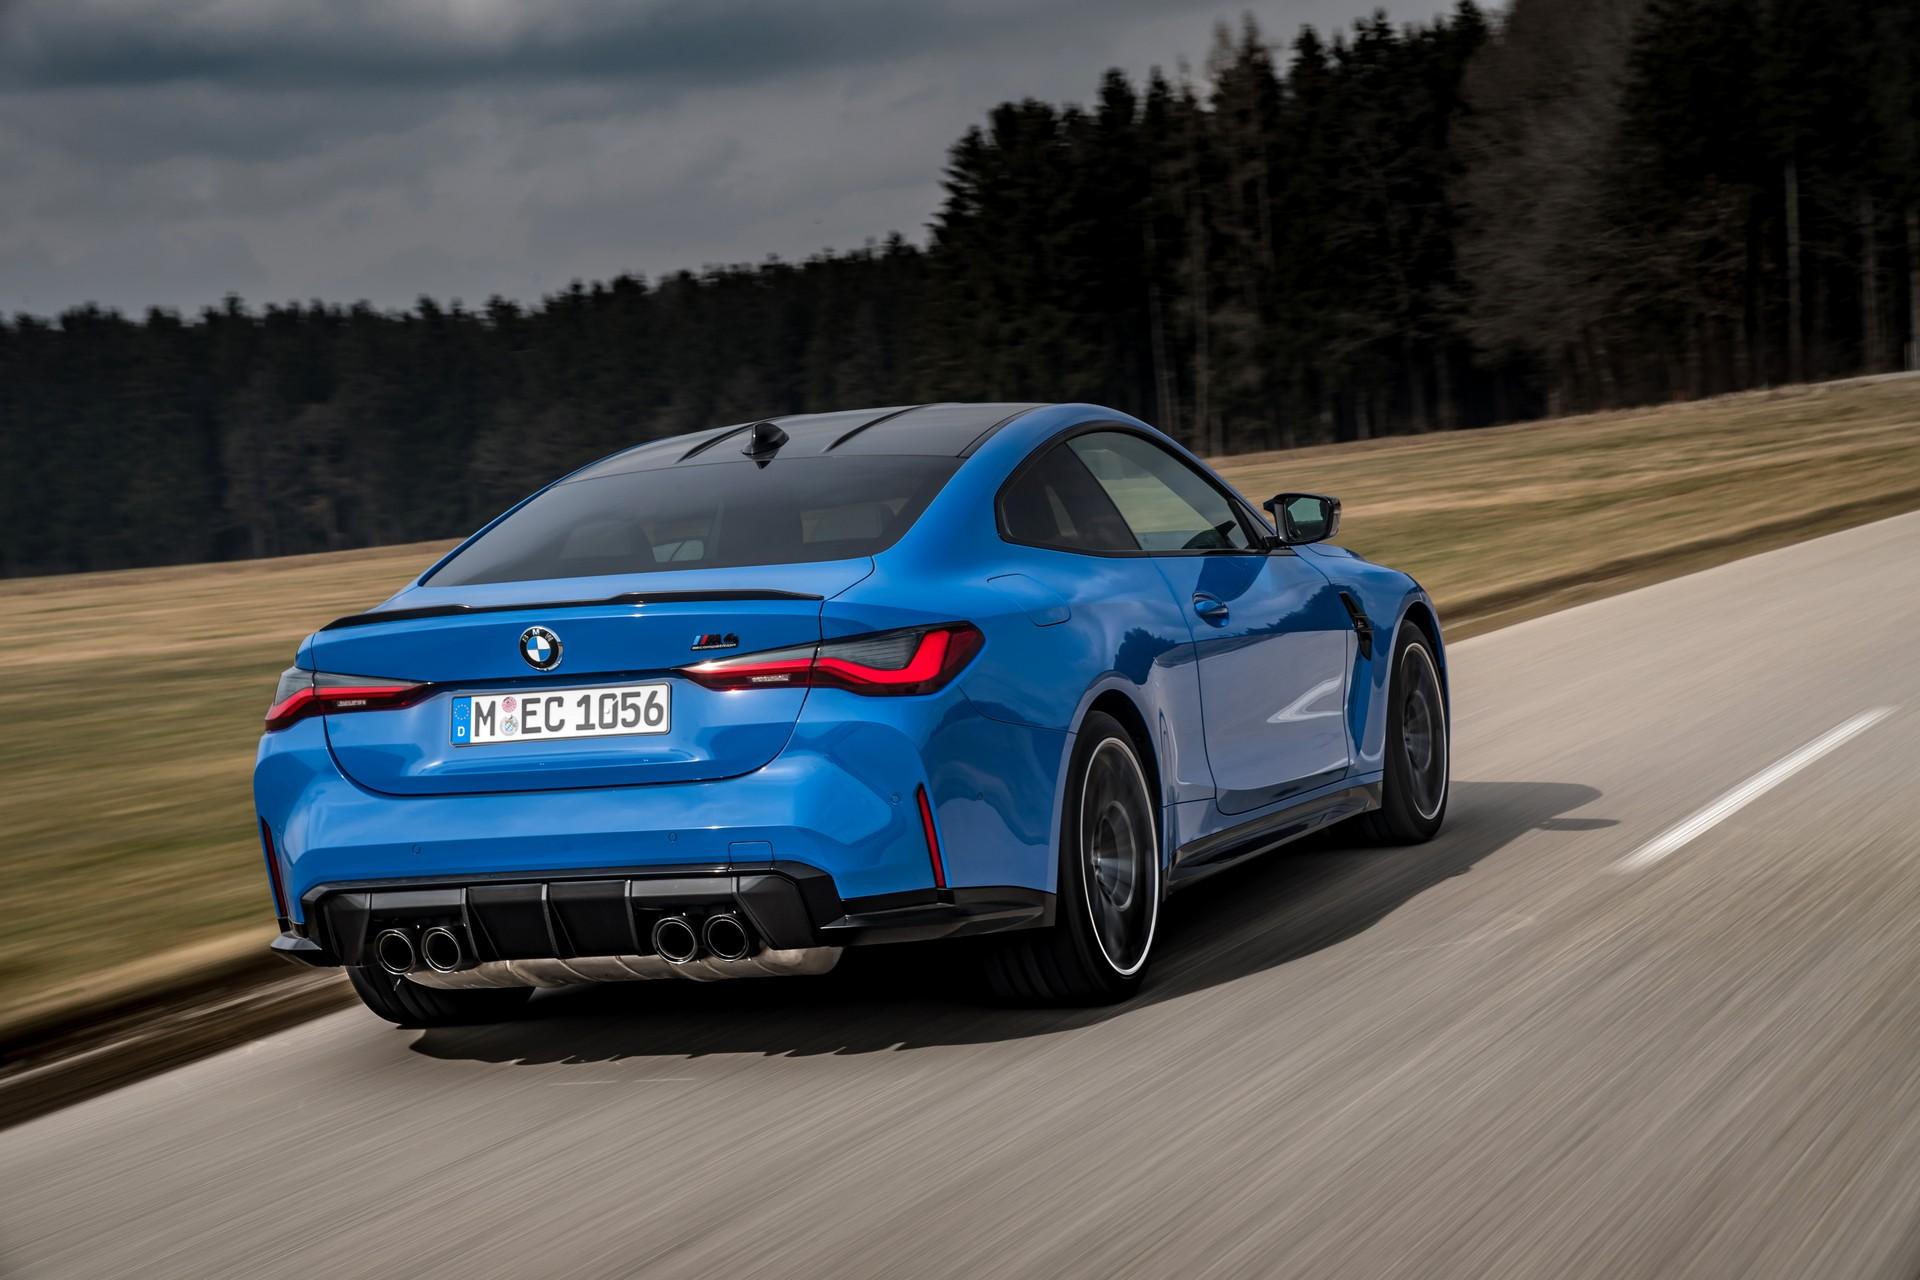 BMW-M3-M4-Competition-xDrive-21.jpg